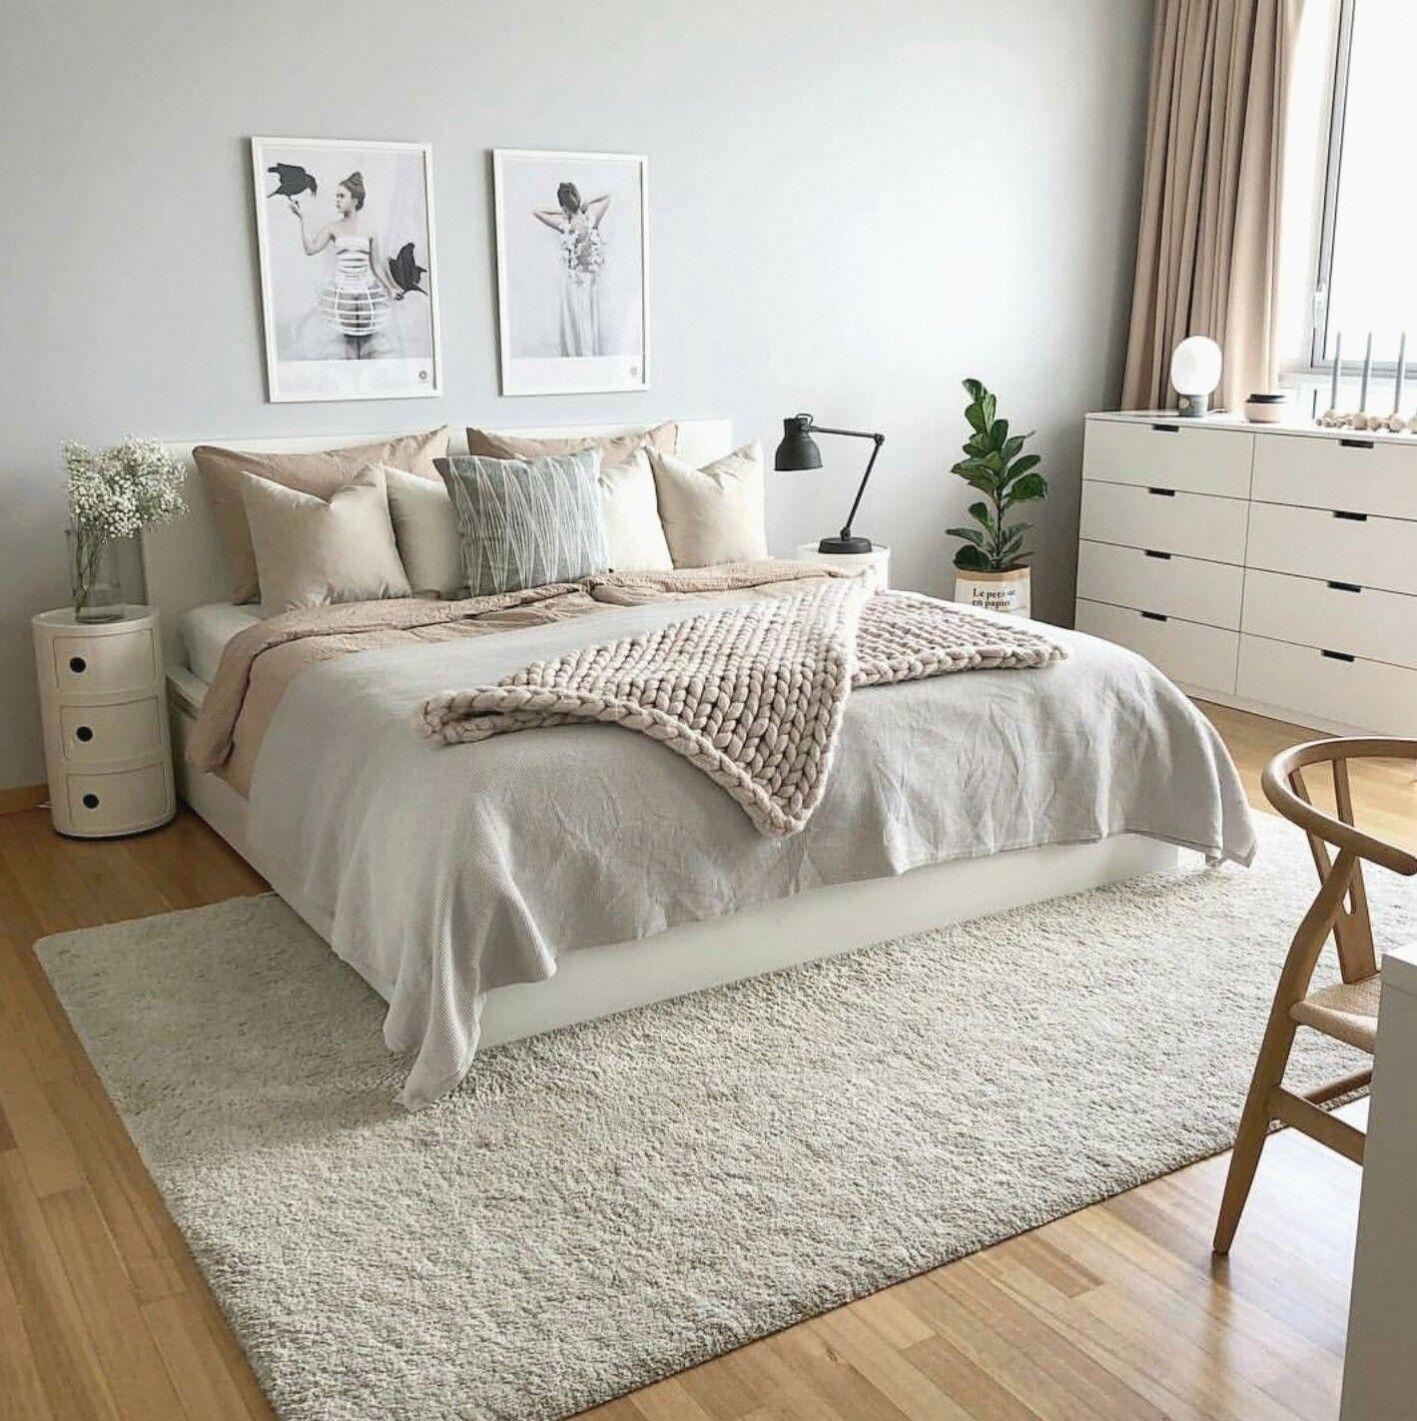 28+ Bedroom furniture for women ideas in 2021